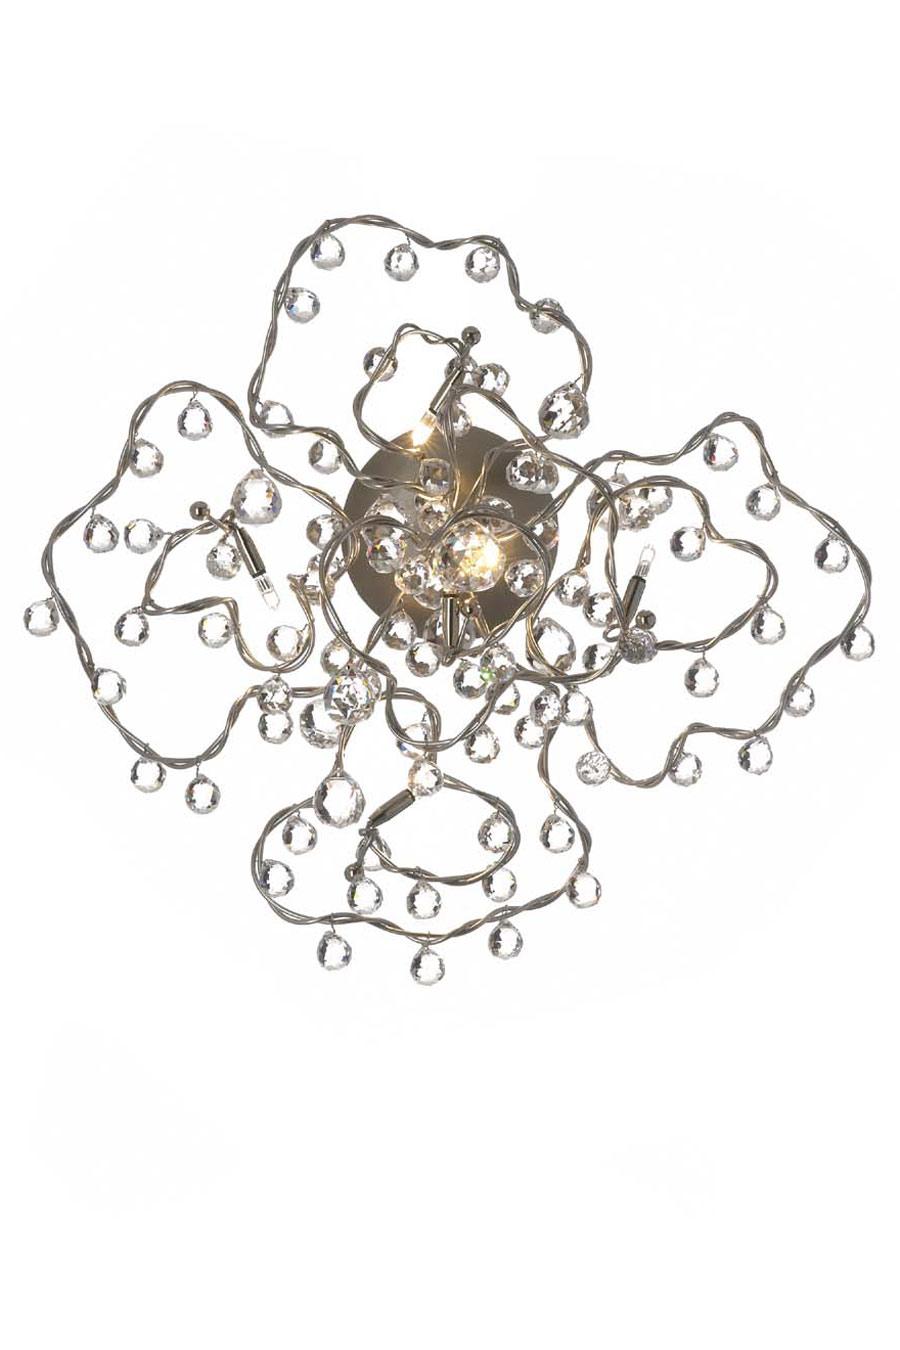 Tiara Diamond applique 5 lumières en verre transparent. Harco Loor.